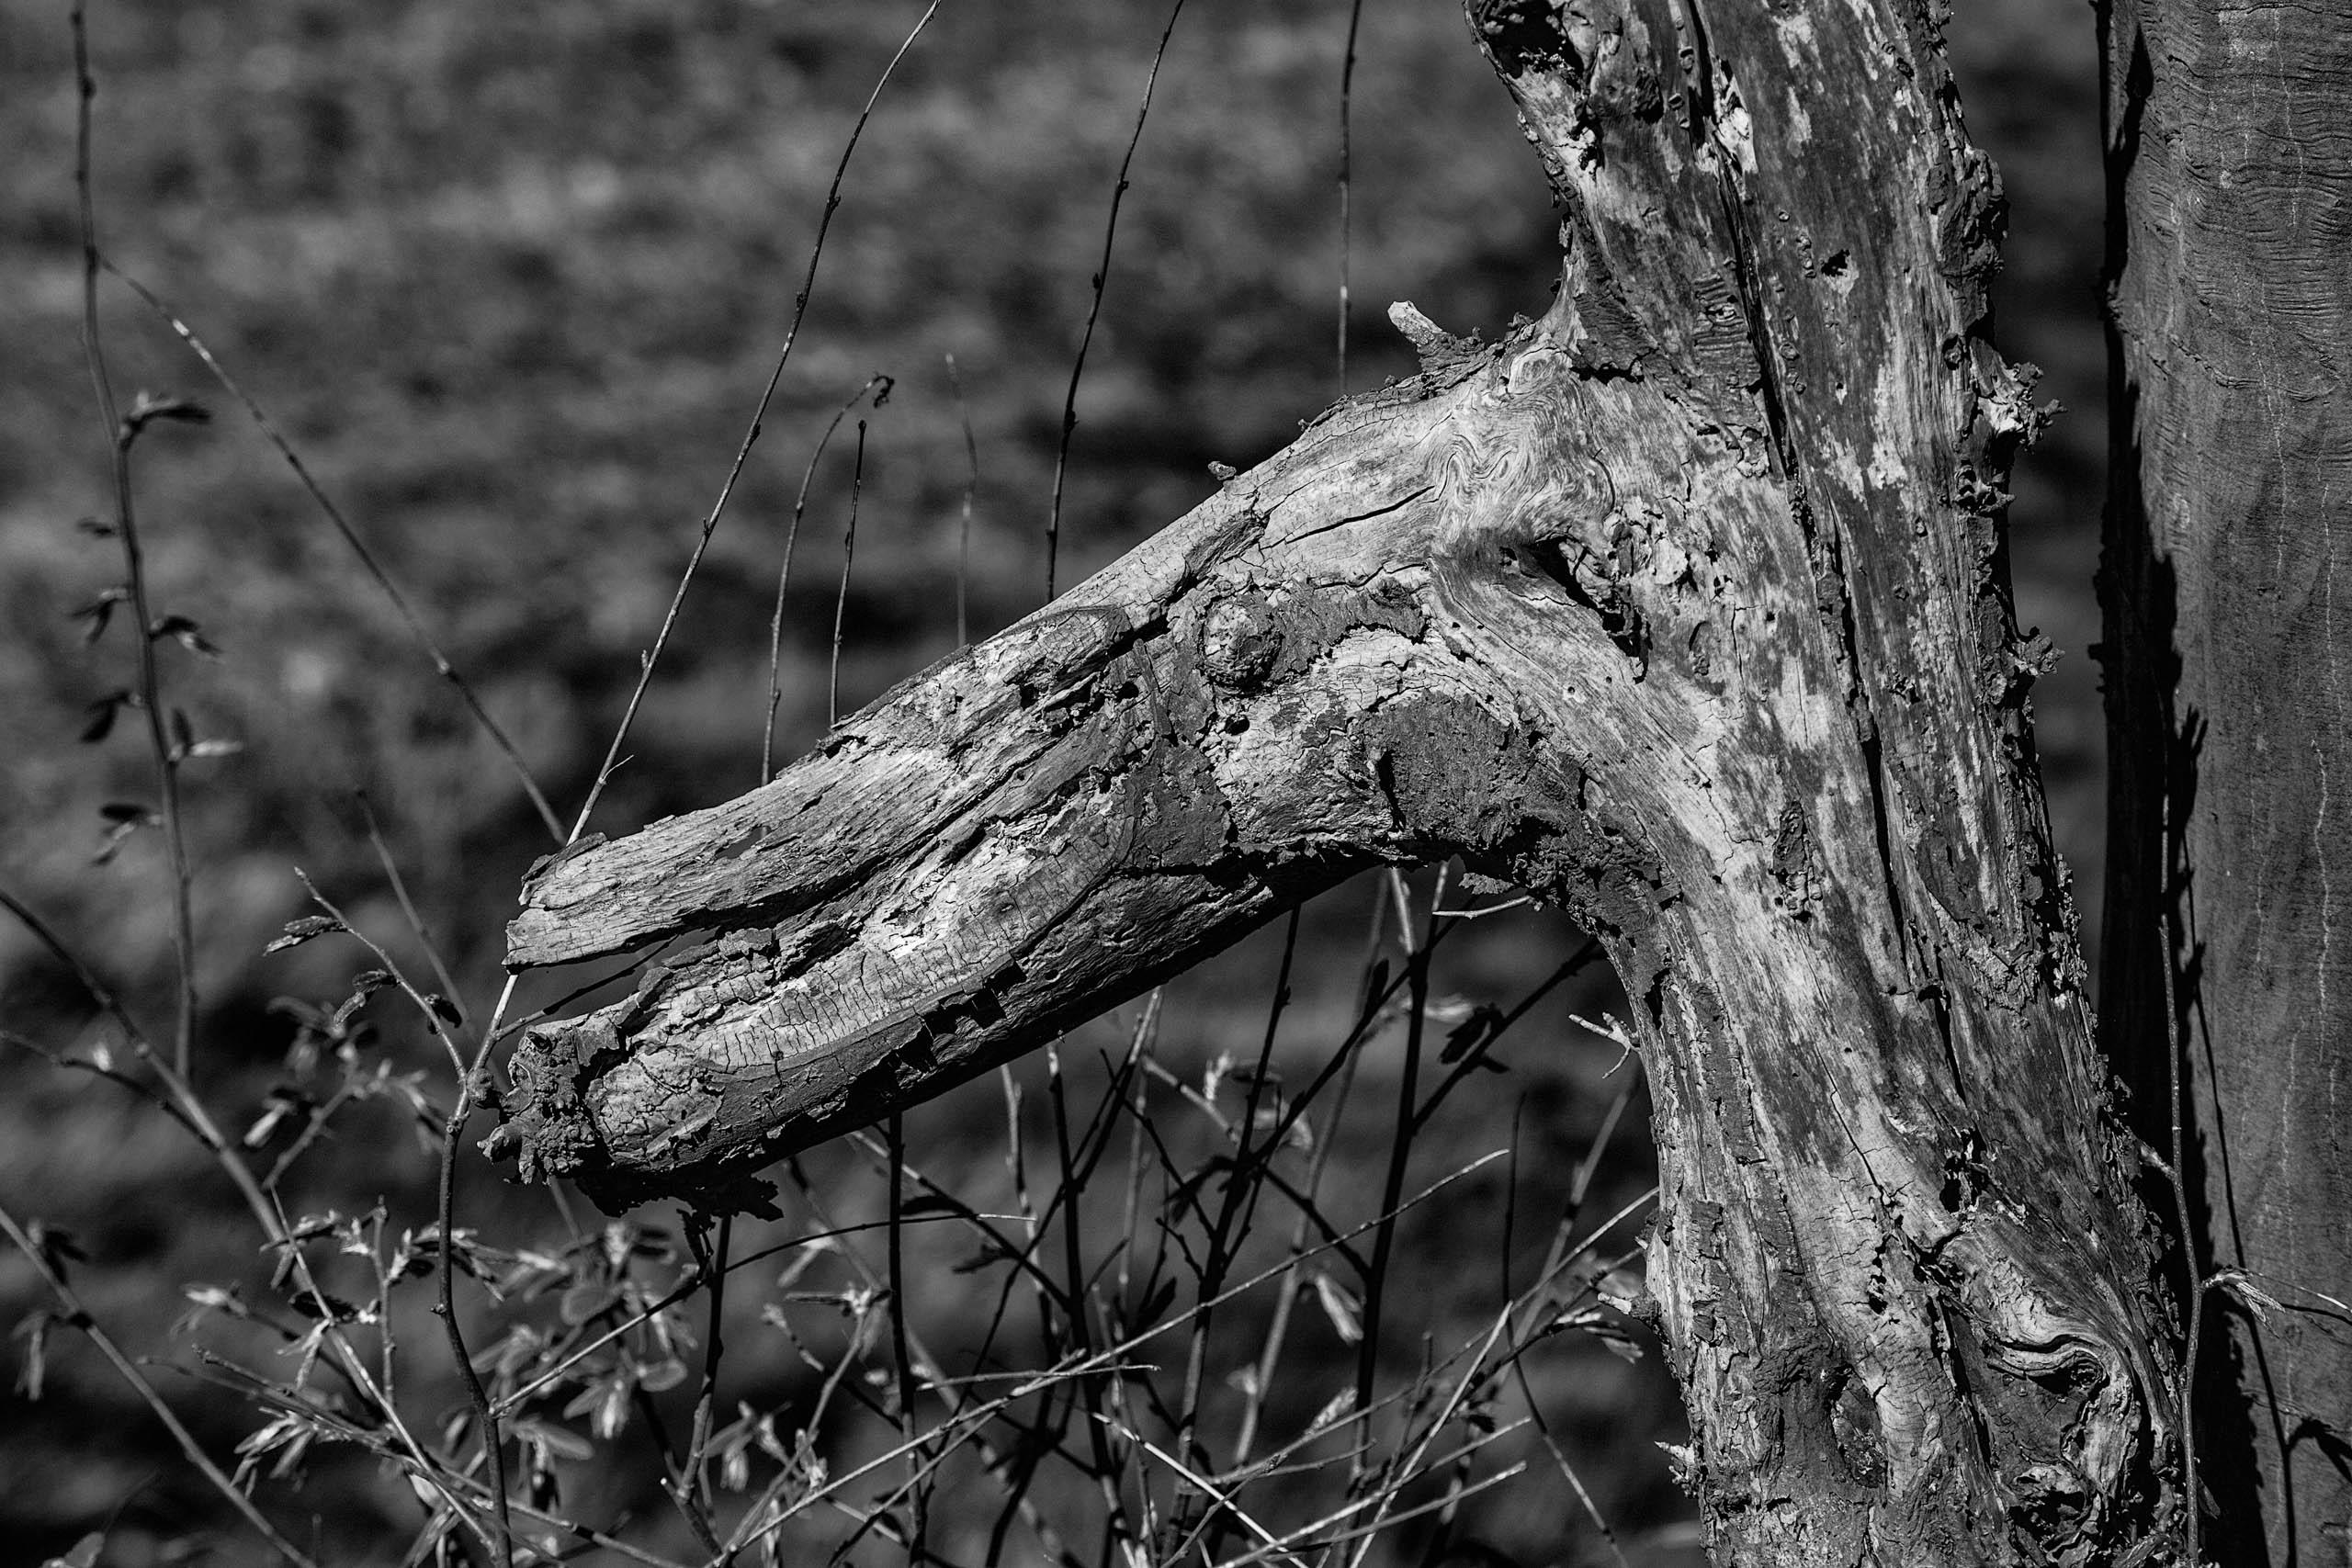 Holz in Form - ein Baum lebt ewig!